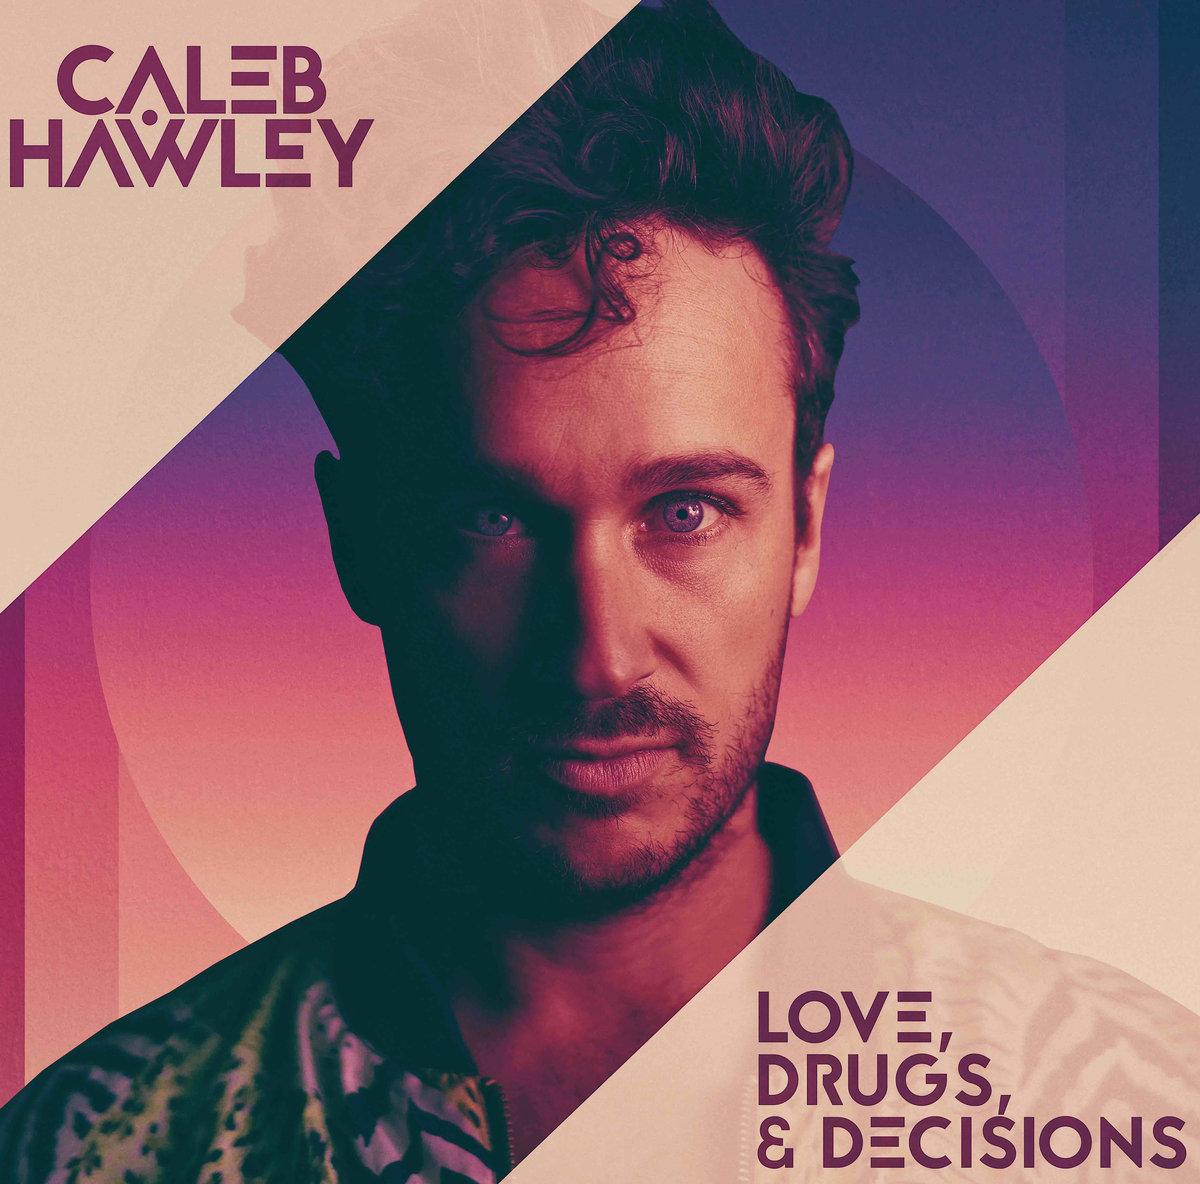 Caleb Hawley - Mix